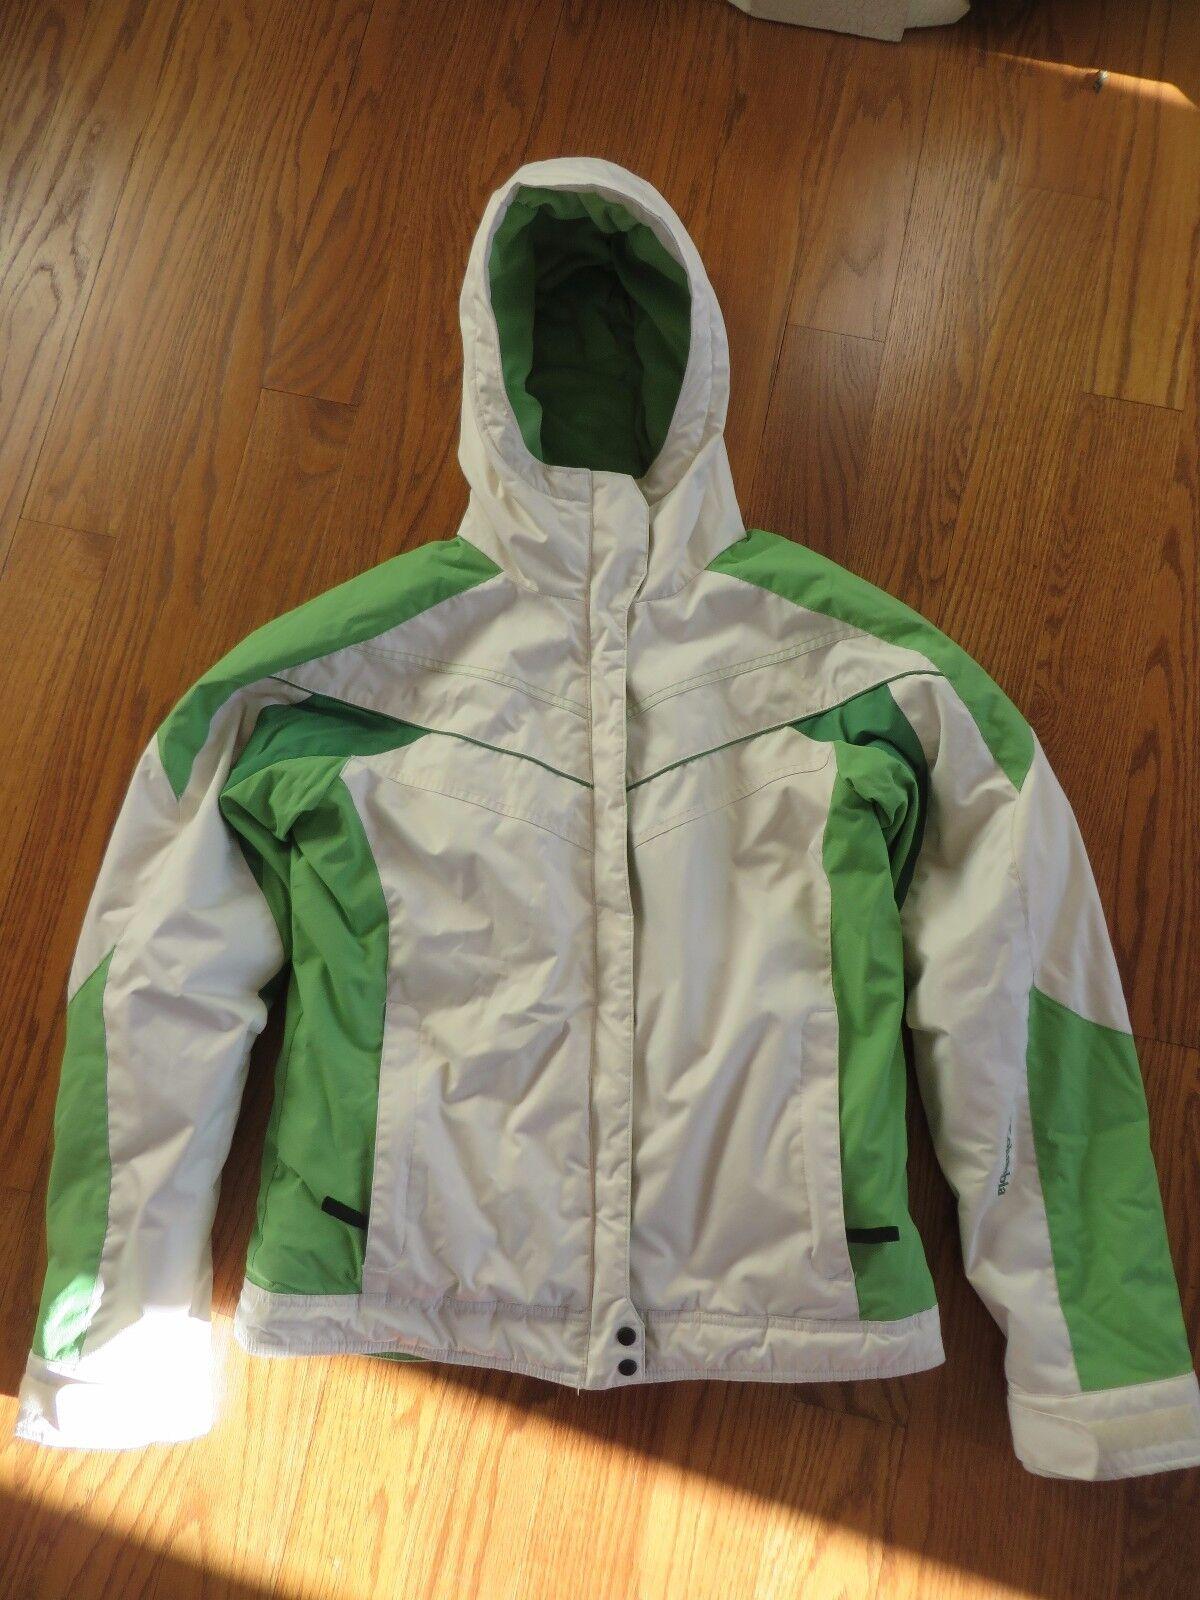 Chaqueta de invierno impermeable con capucha Columbia Girls Green Off White para jóvenes 18/20 EUC